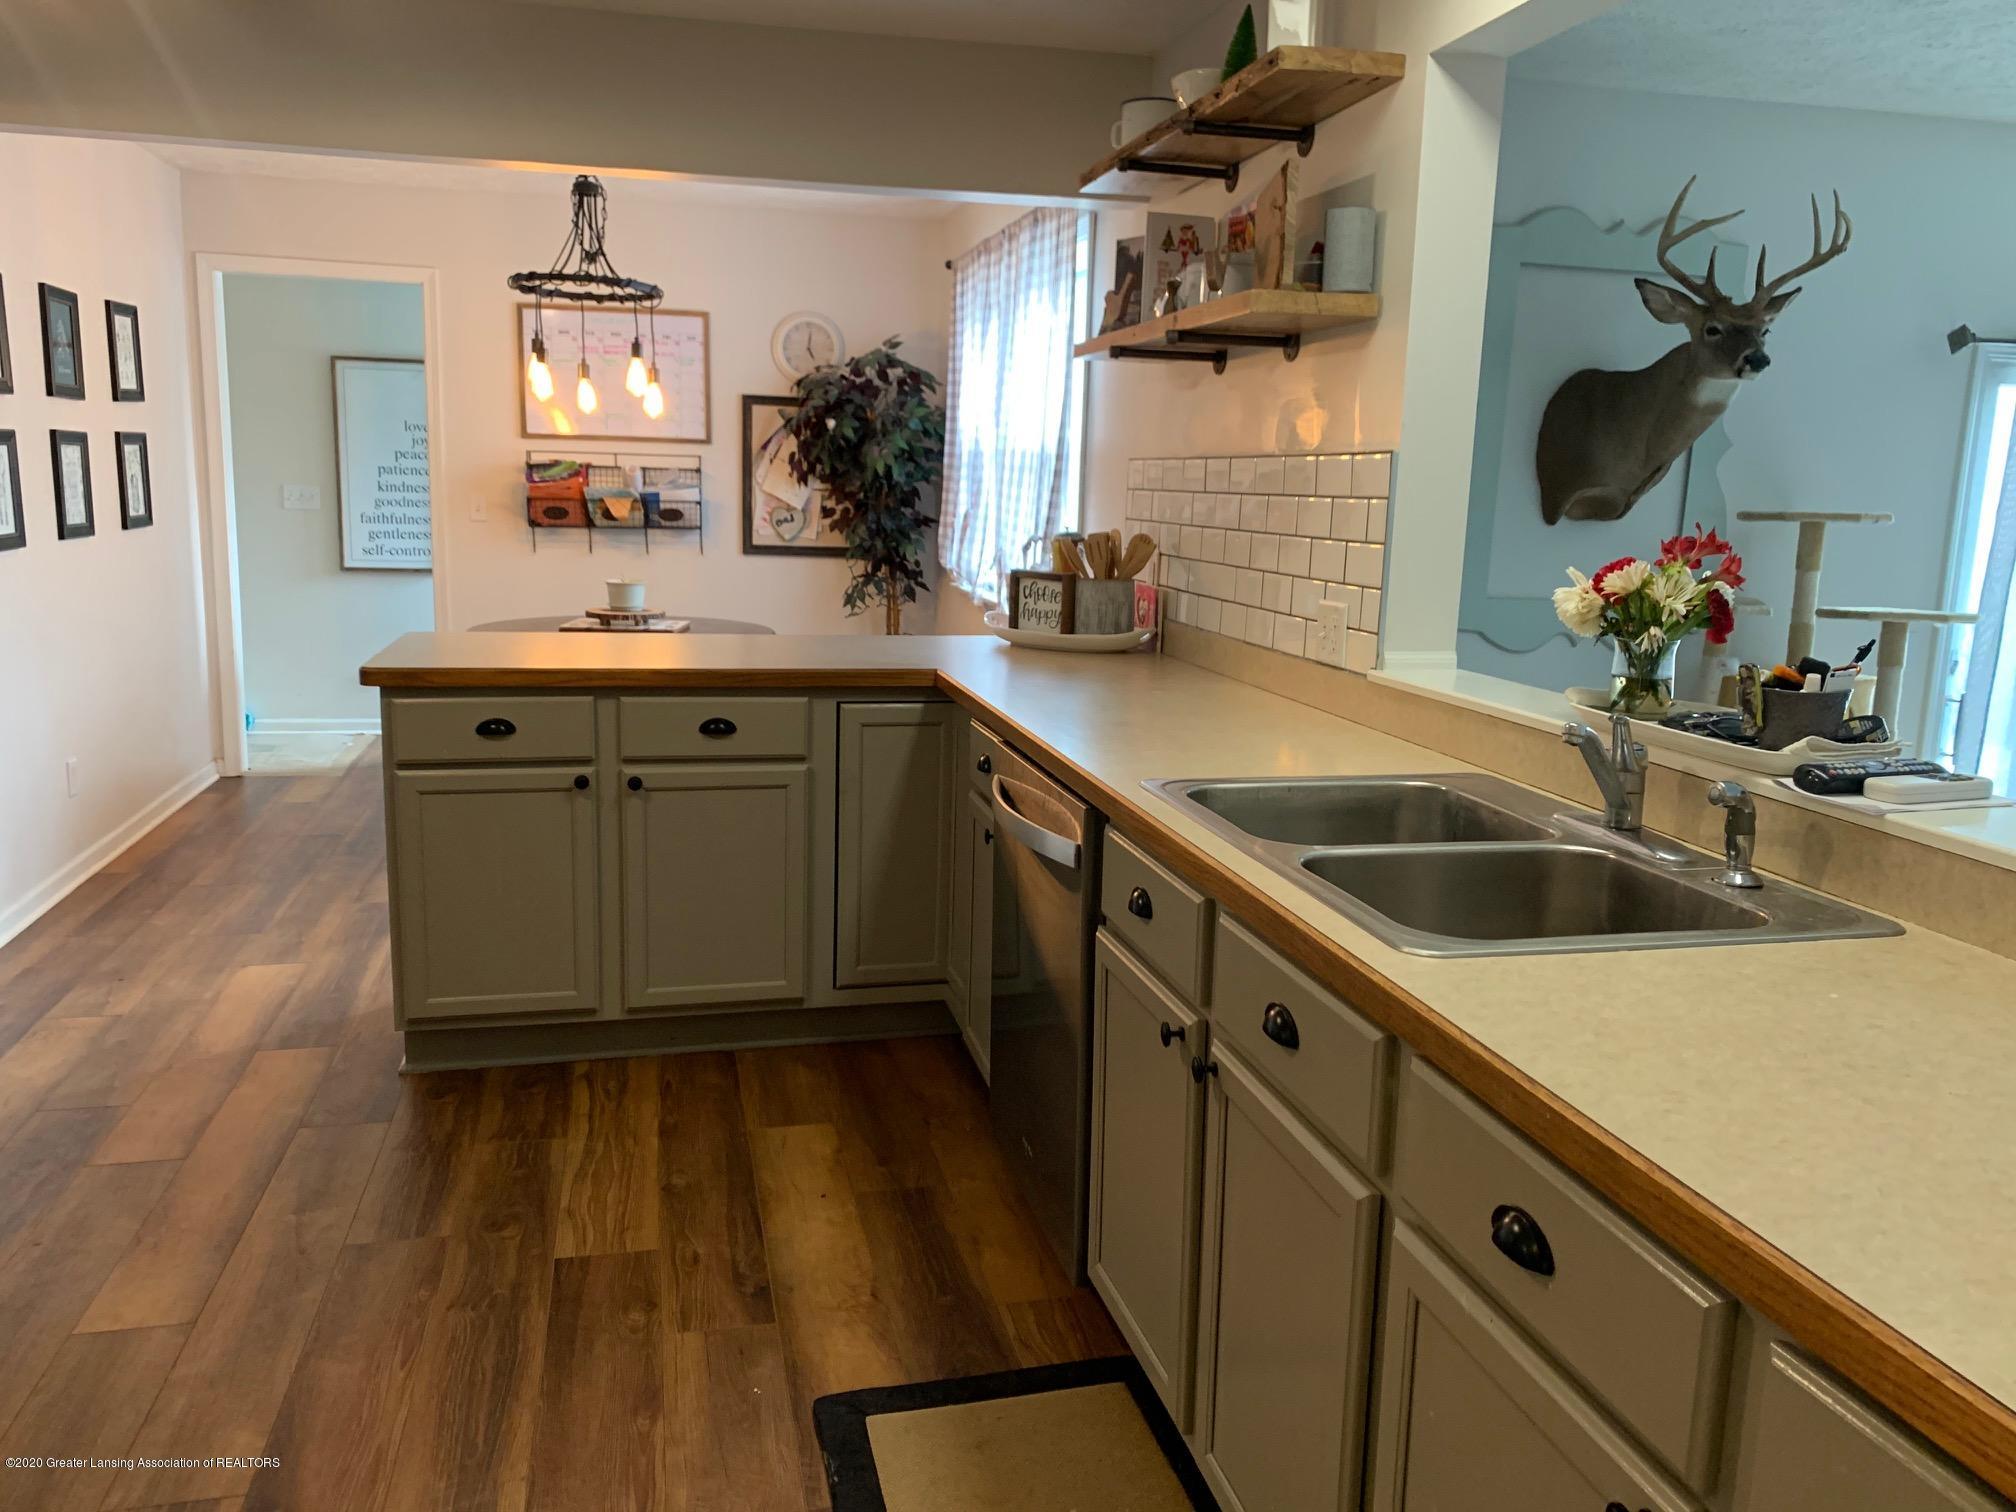 2096 S Perkey Rd - Kitchen - 8